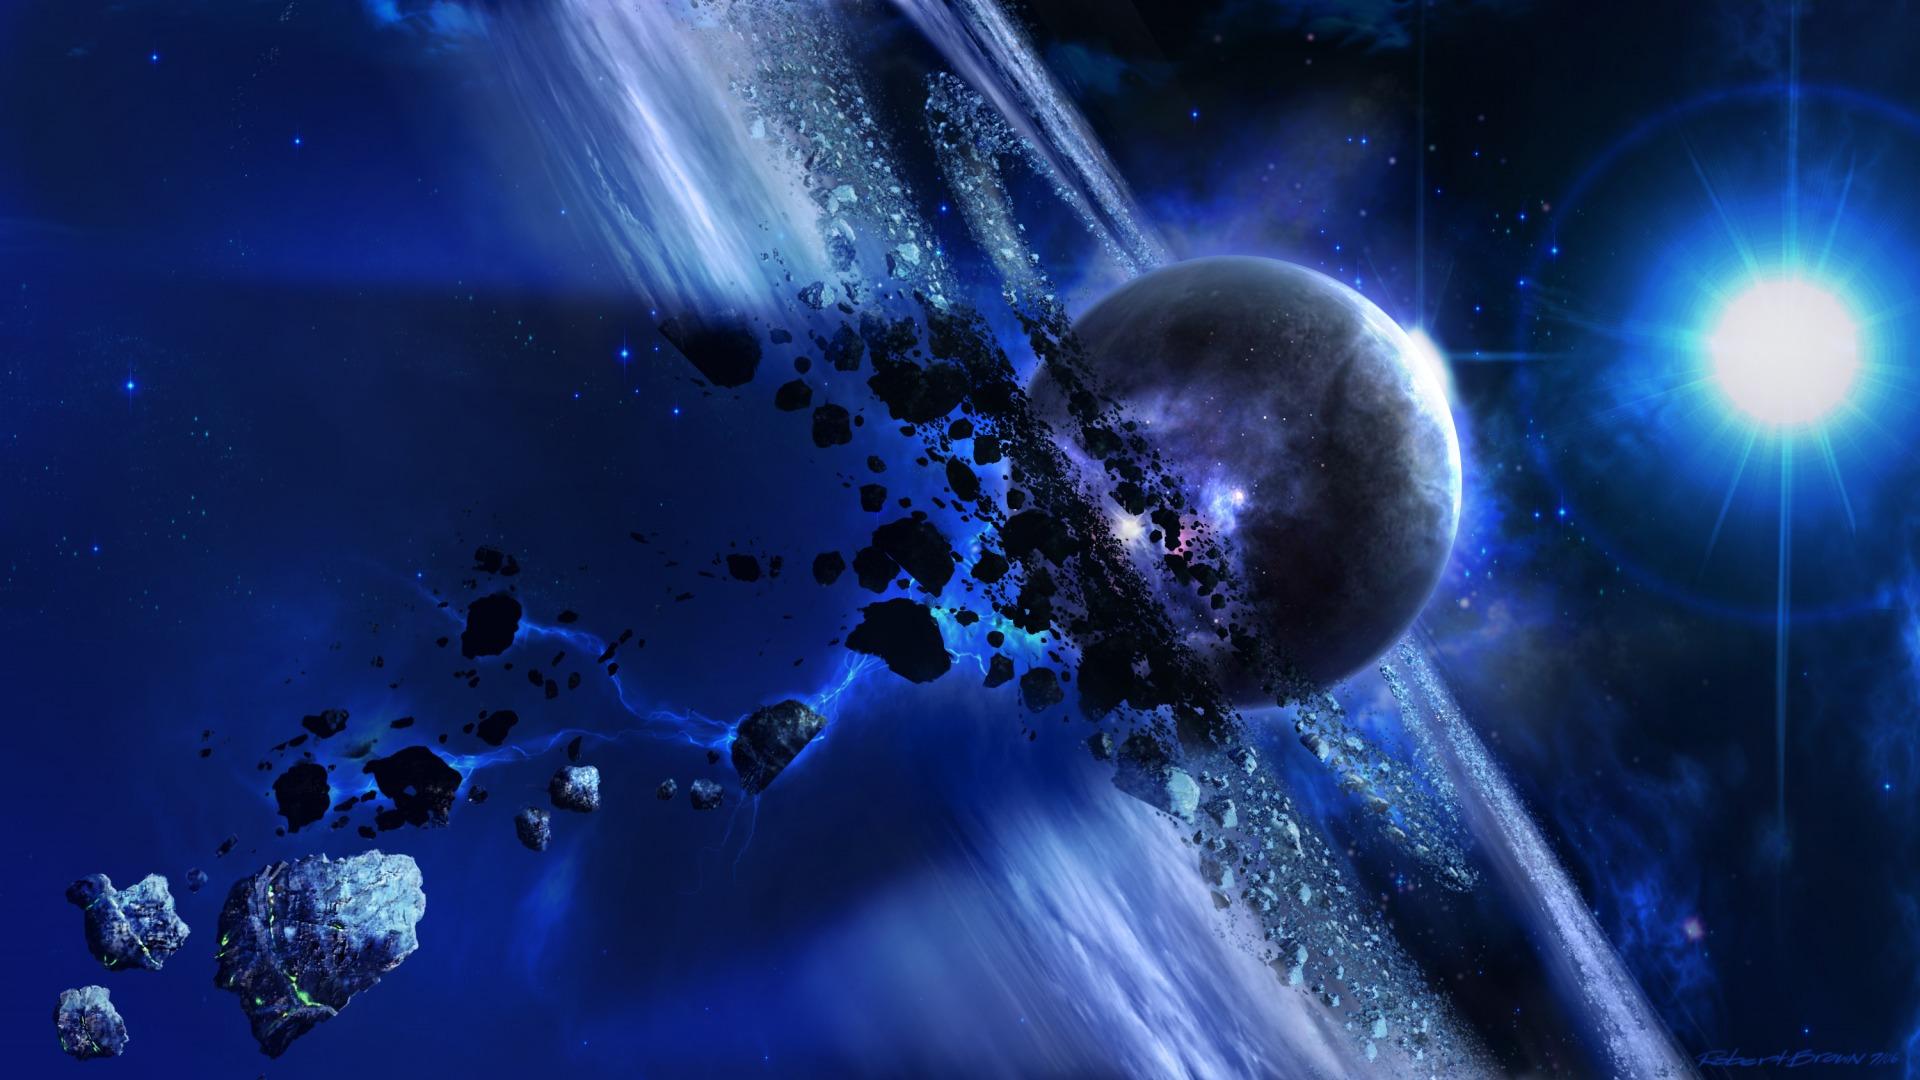 Цербер. Planet10